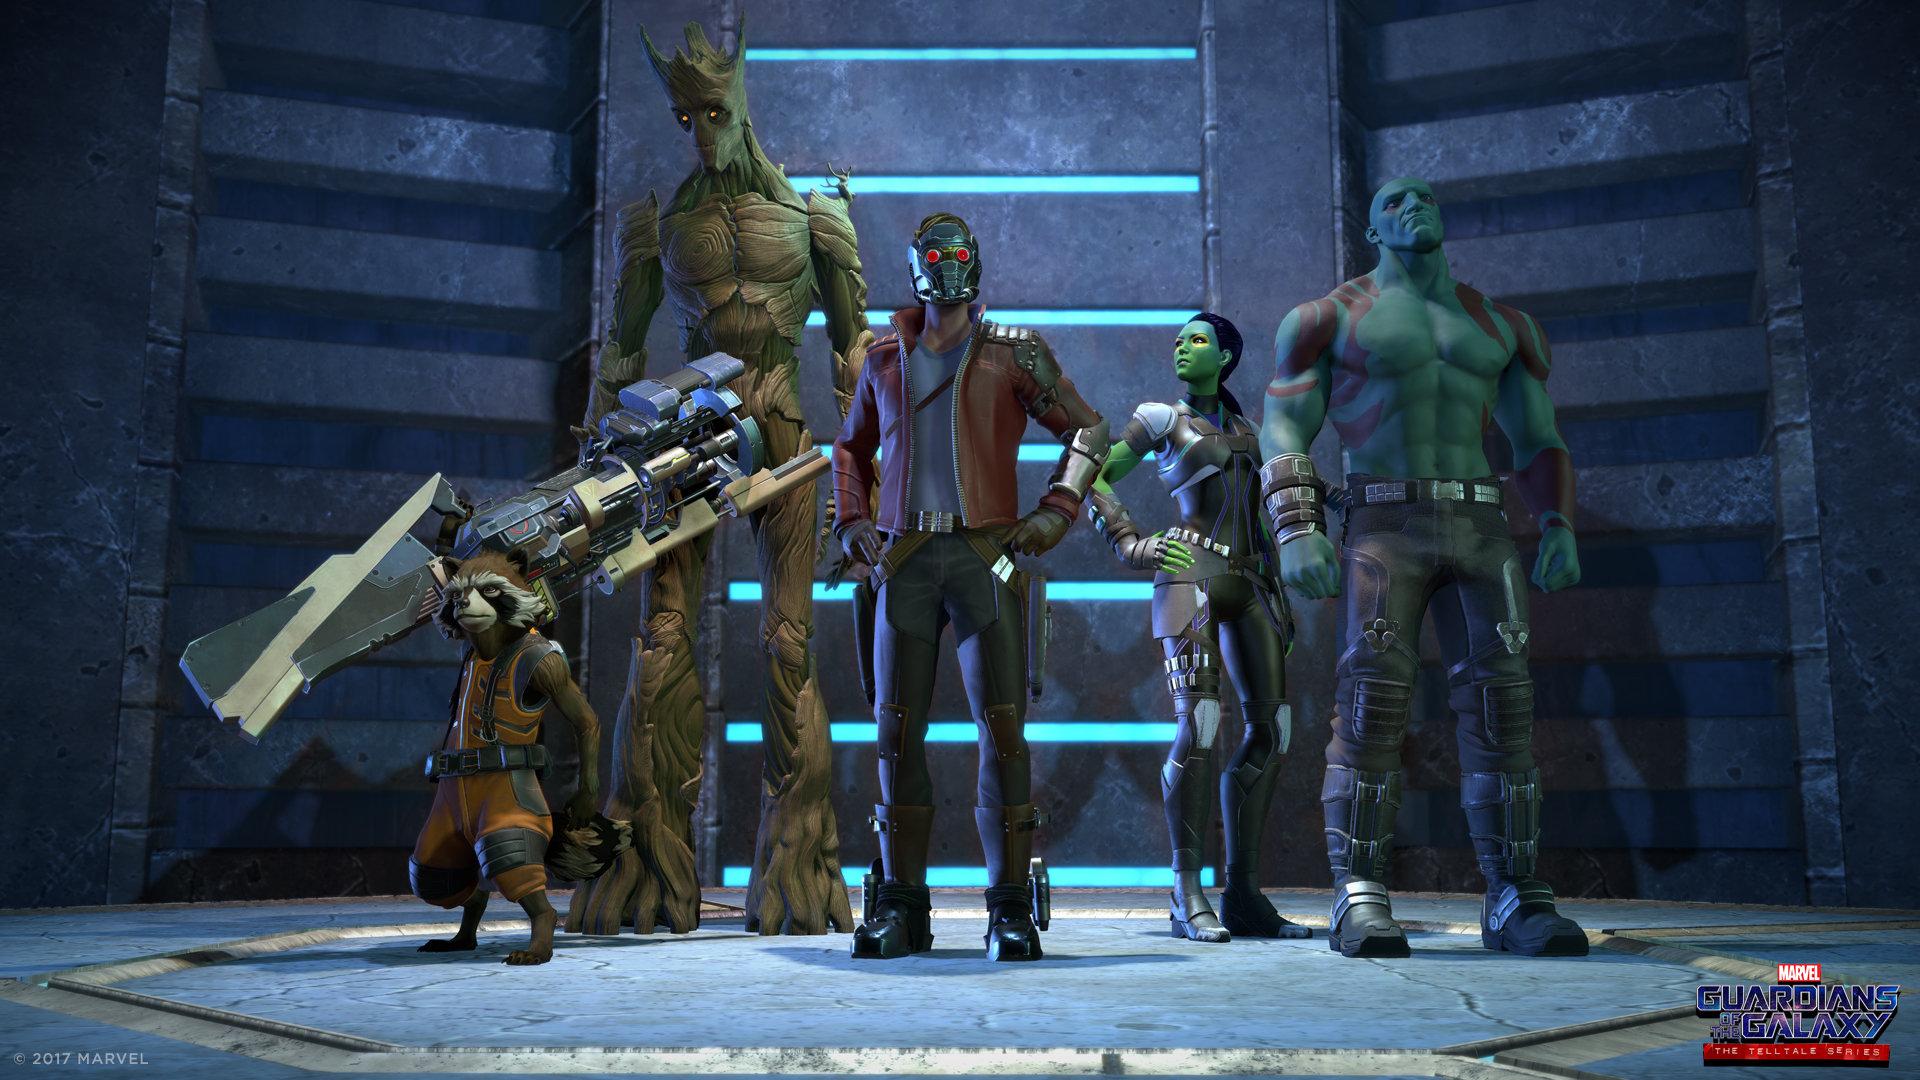 Guardianes de la Galaxia: The Telltale Series